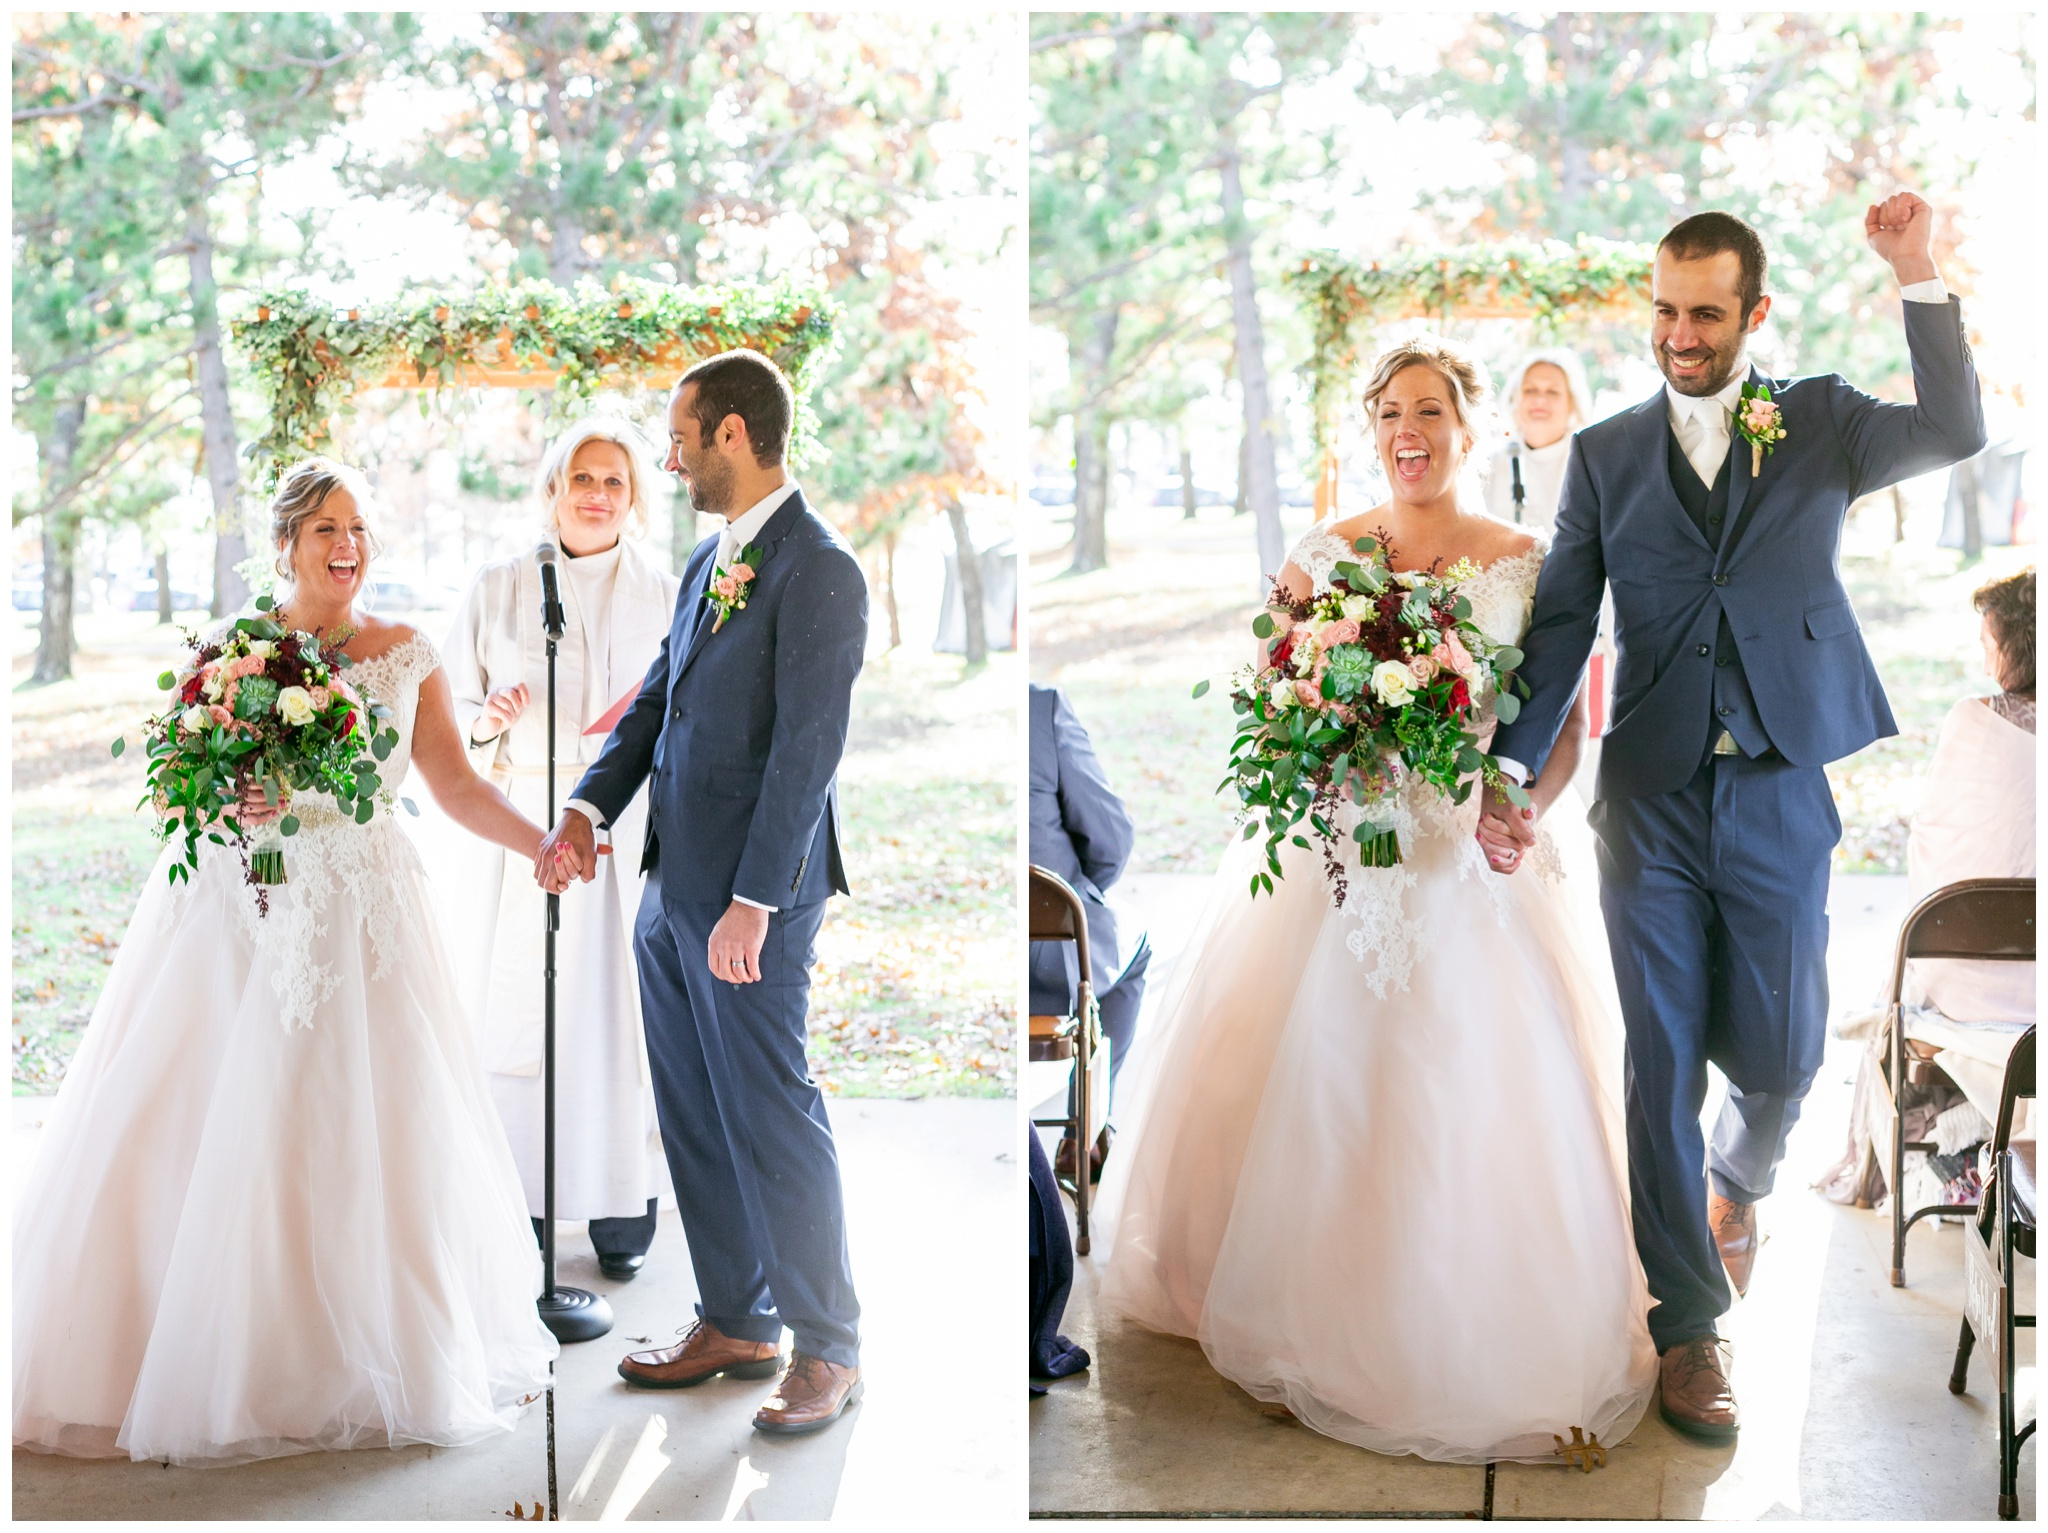 Shawano_County_park_Wedding_Caynay_Photo_Madison_Wi_2294.jpg